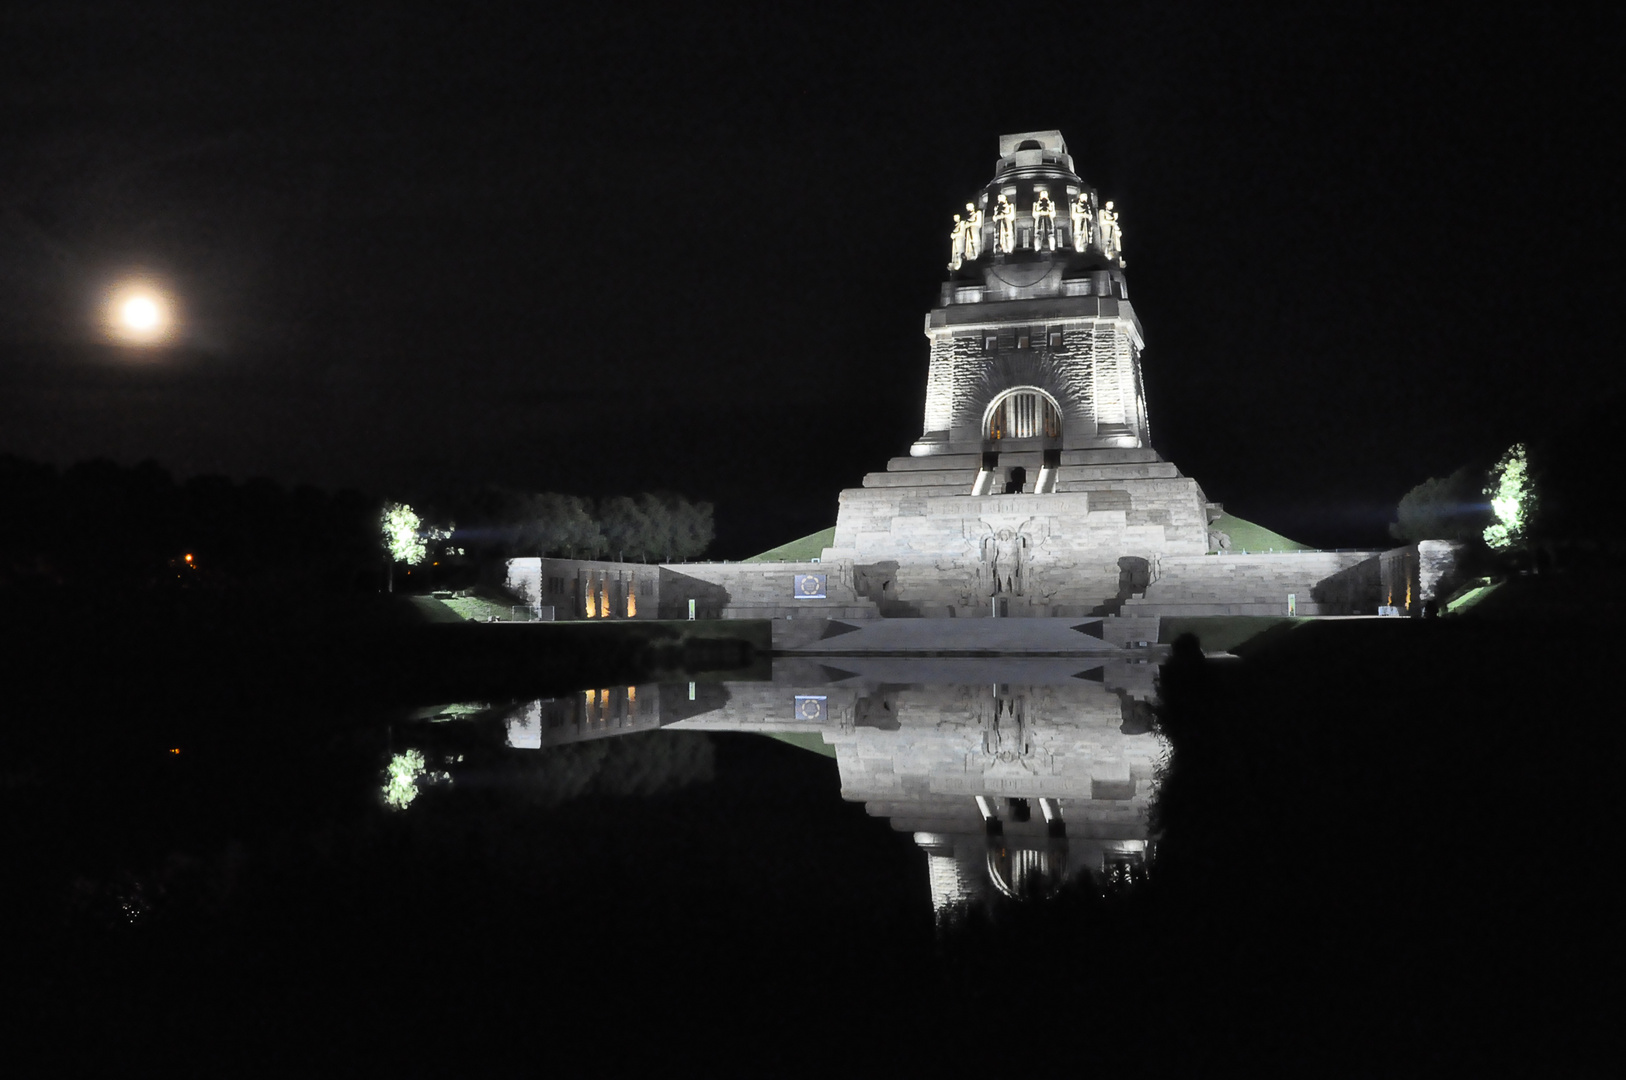 Das Völkerschlachtdenkmal bei Nacht kurz vor dem 200jährigen Jubiläum der Völkerschlacht bei Leipzig